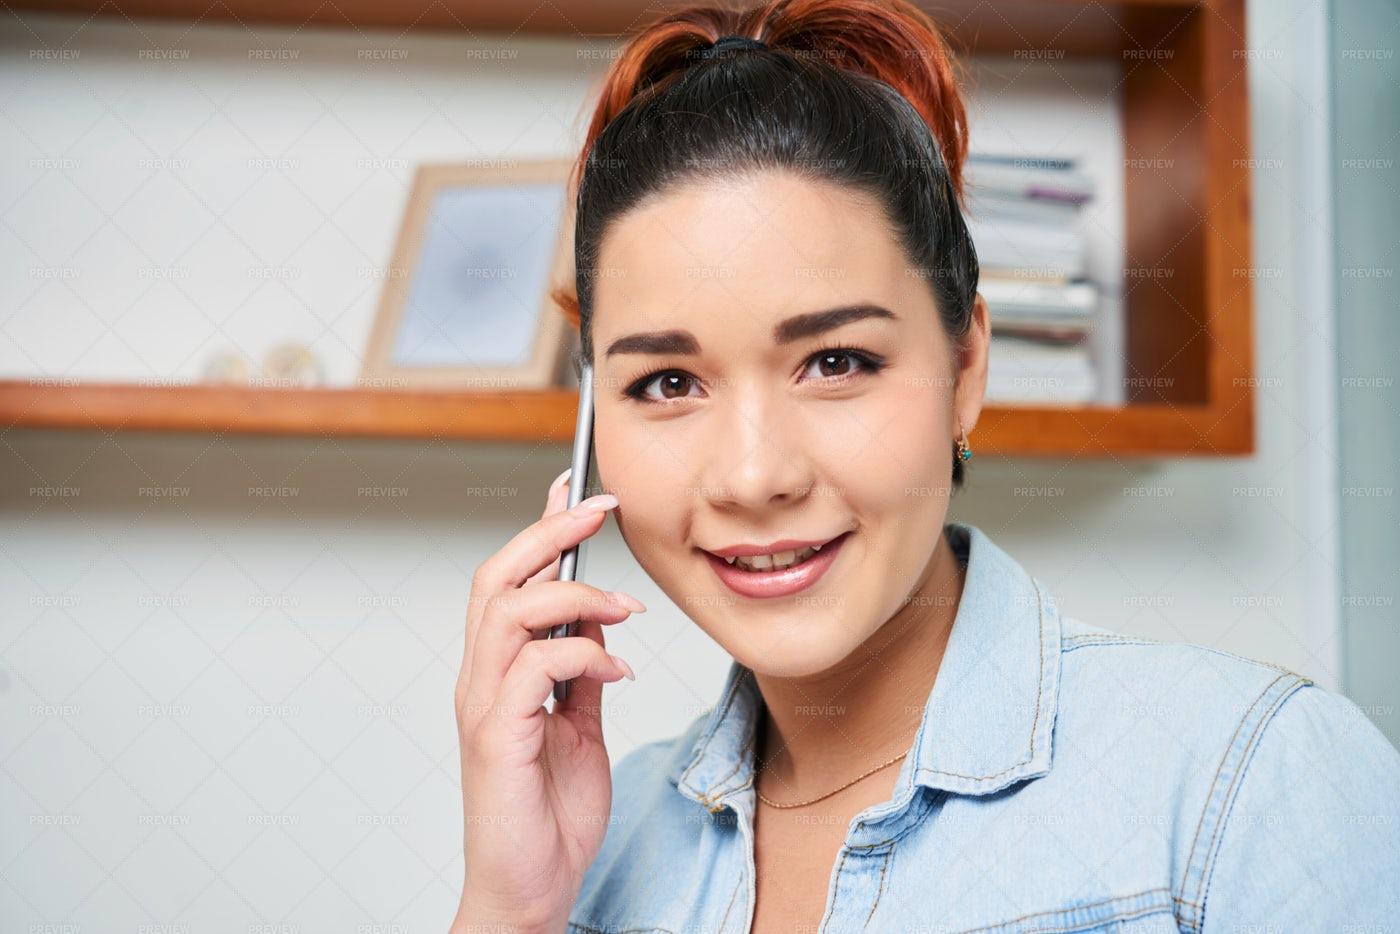 Woman Has A Conversation On Phone: Stock Photos